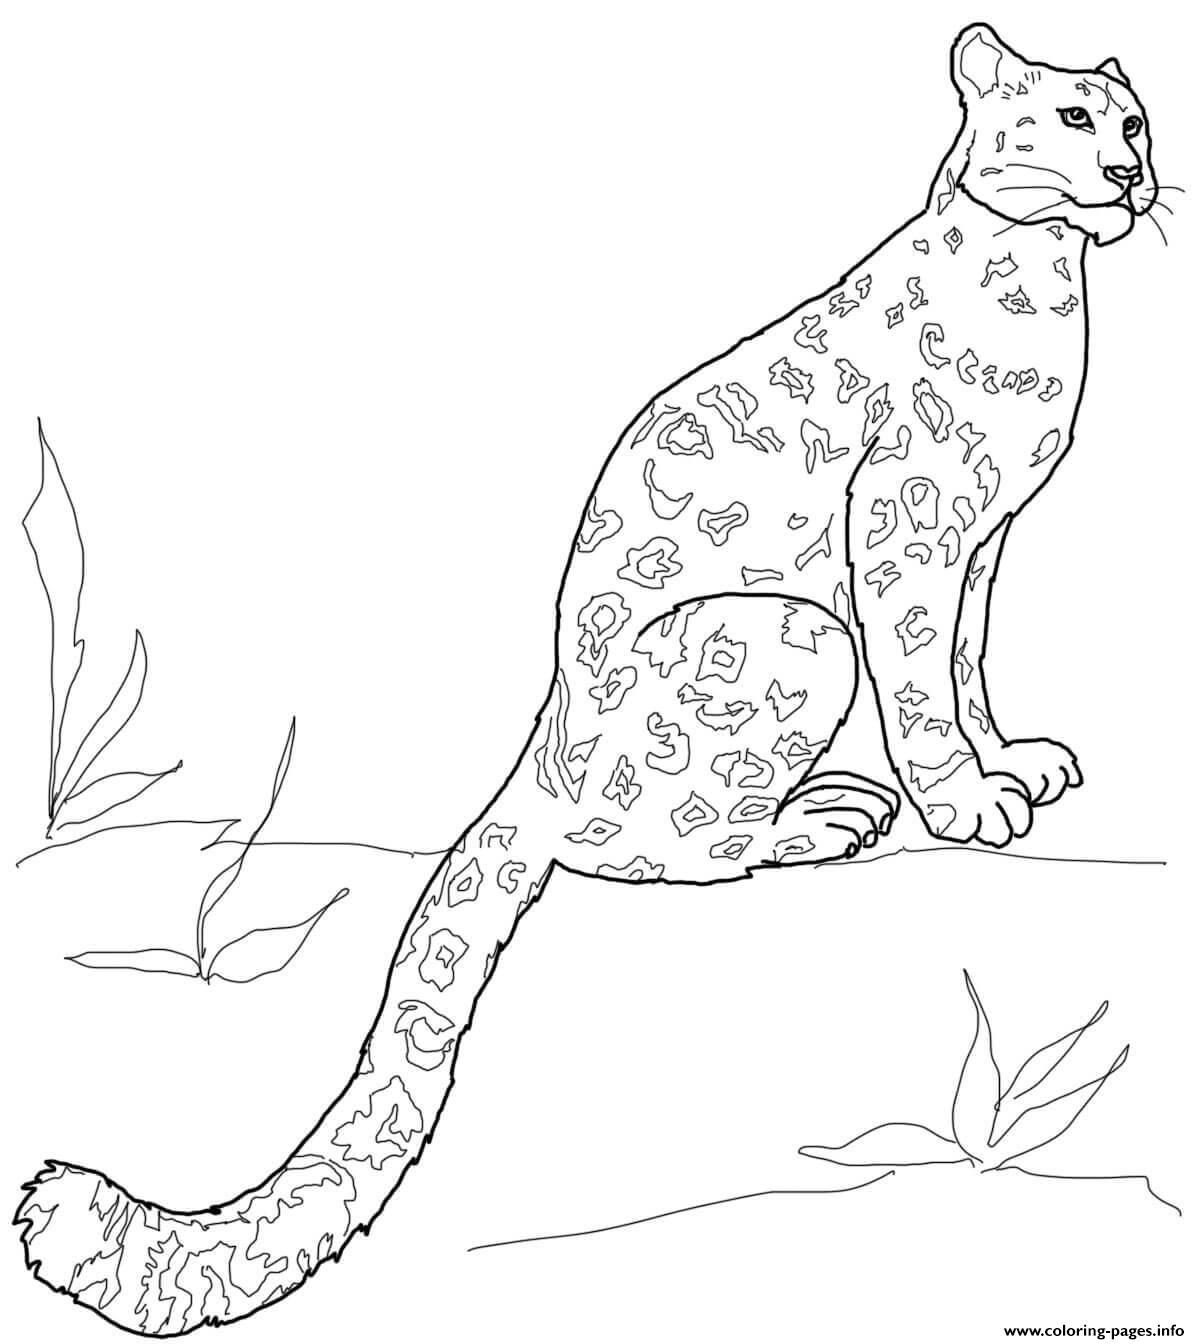 Snow Leopard Sitting Coloring Pages Printable intérieur Coloriage Panthere